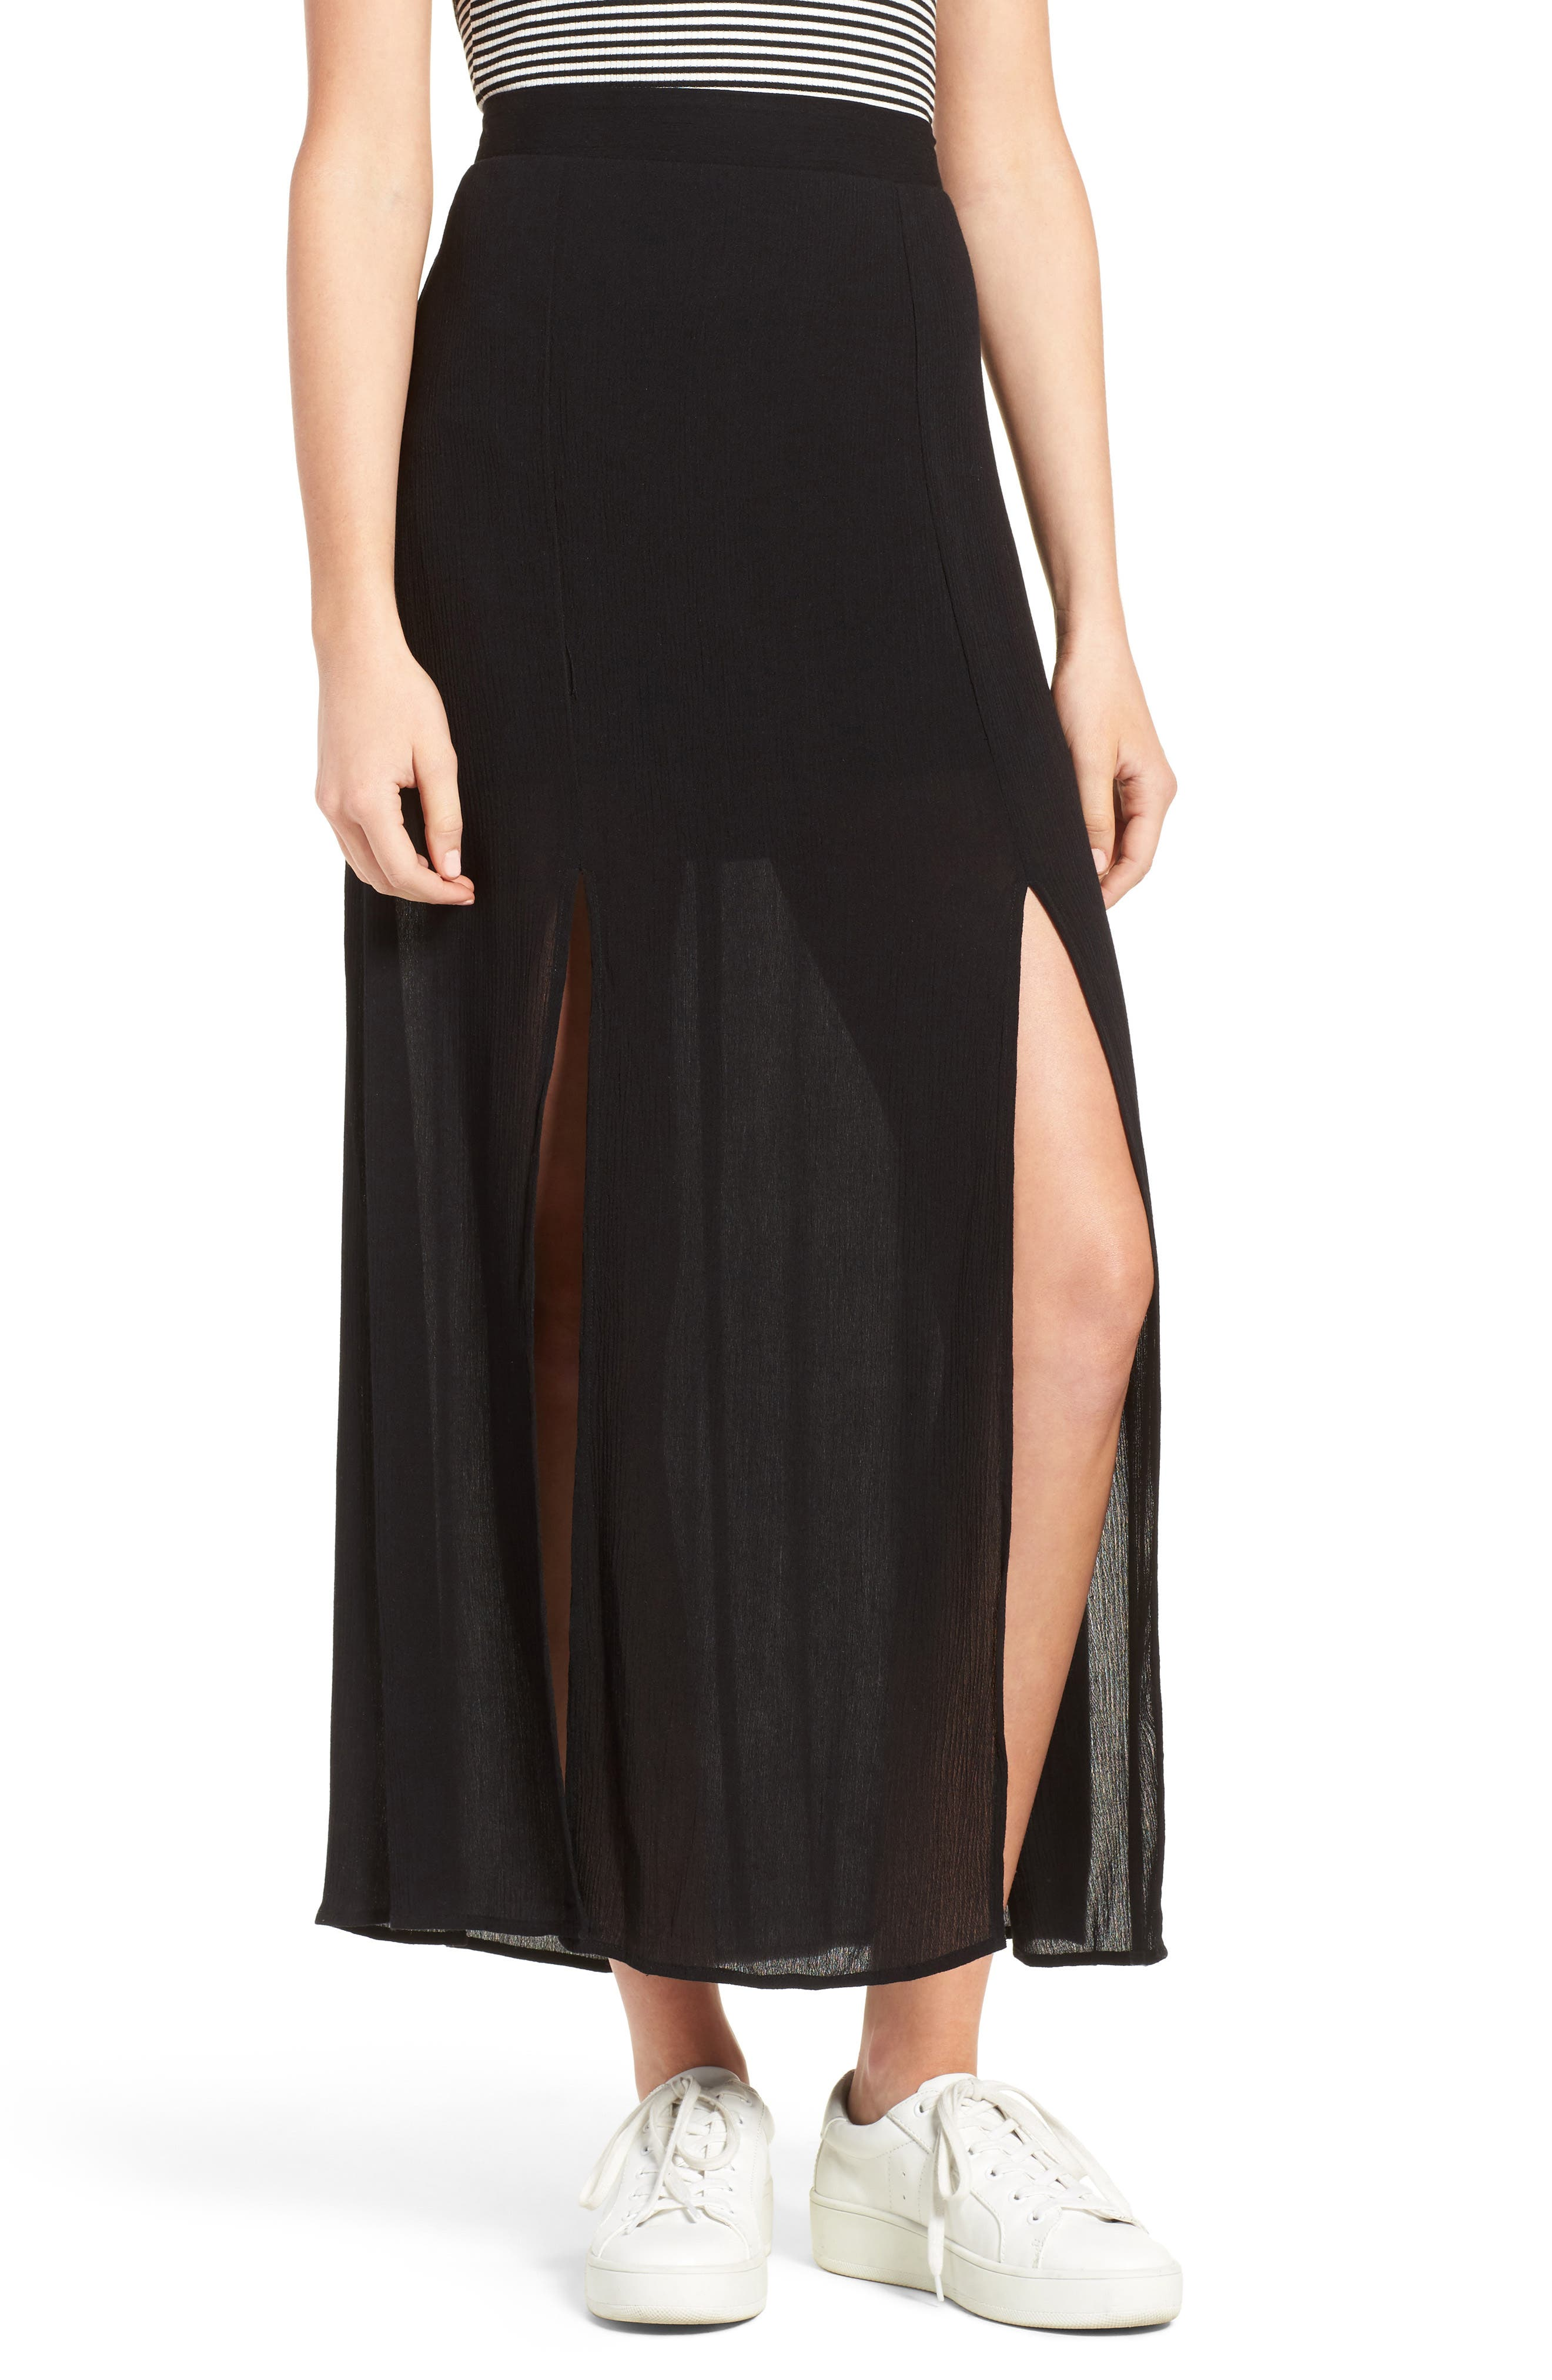 Main Image - Love, Fire Slit Maxi Skirt